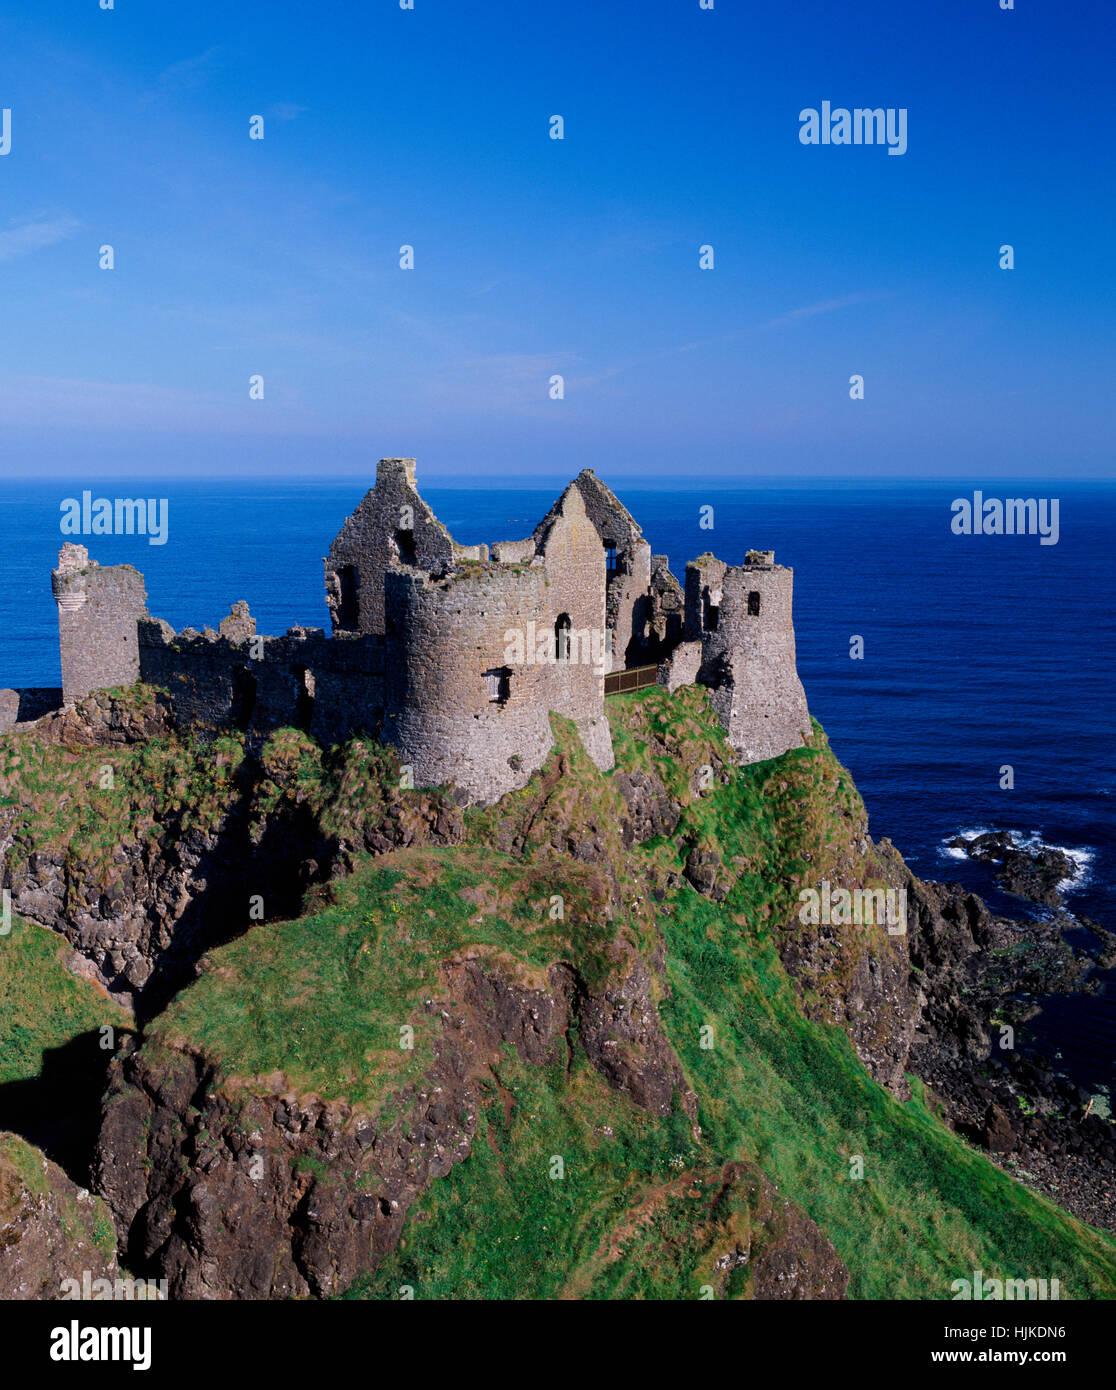 Dunluce Castle, County Antrim, Northern Ireland, UK - Stock Image